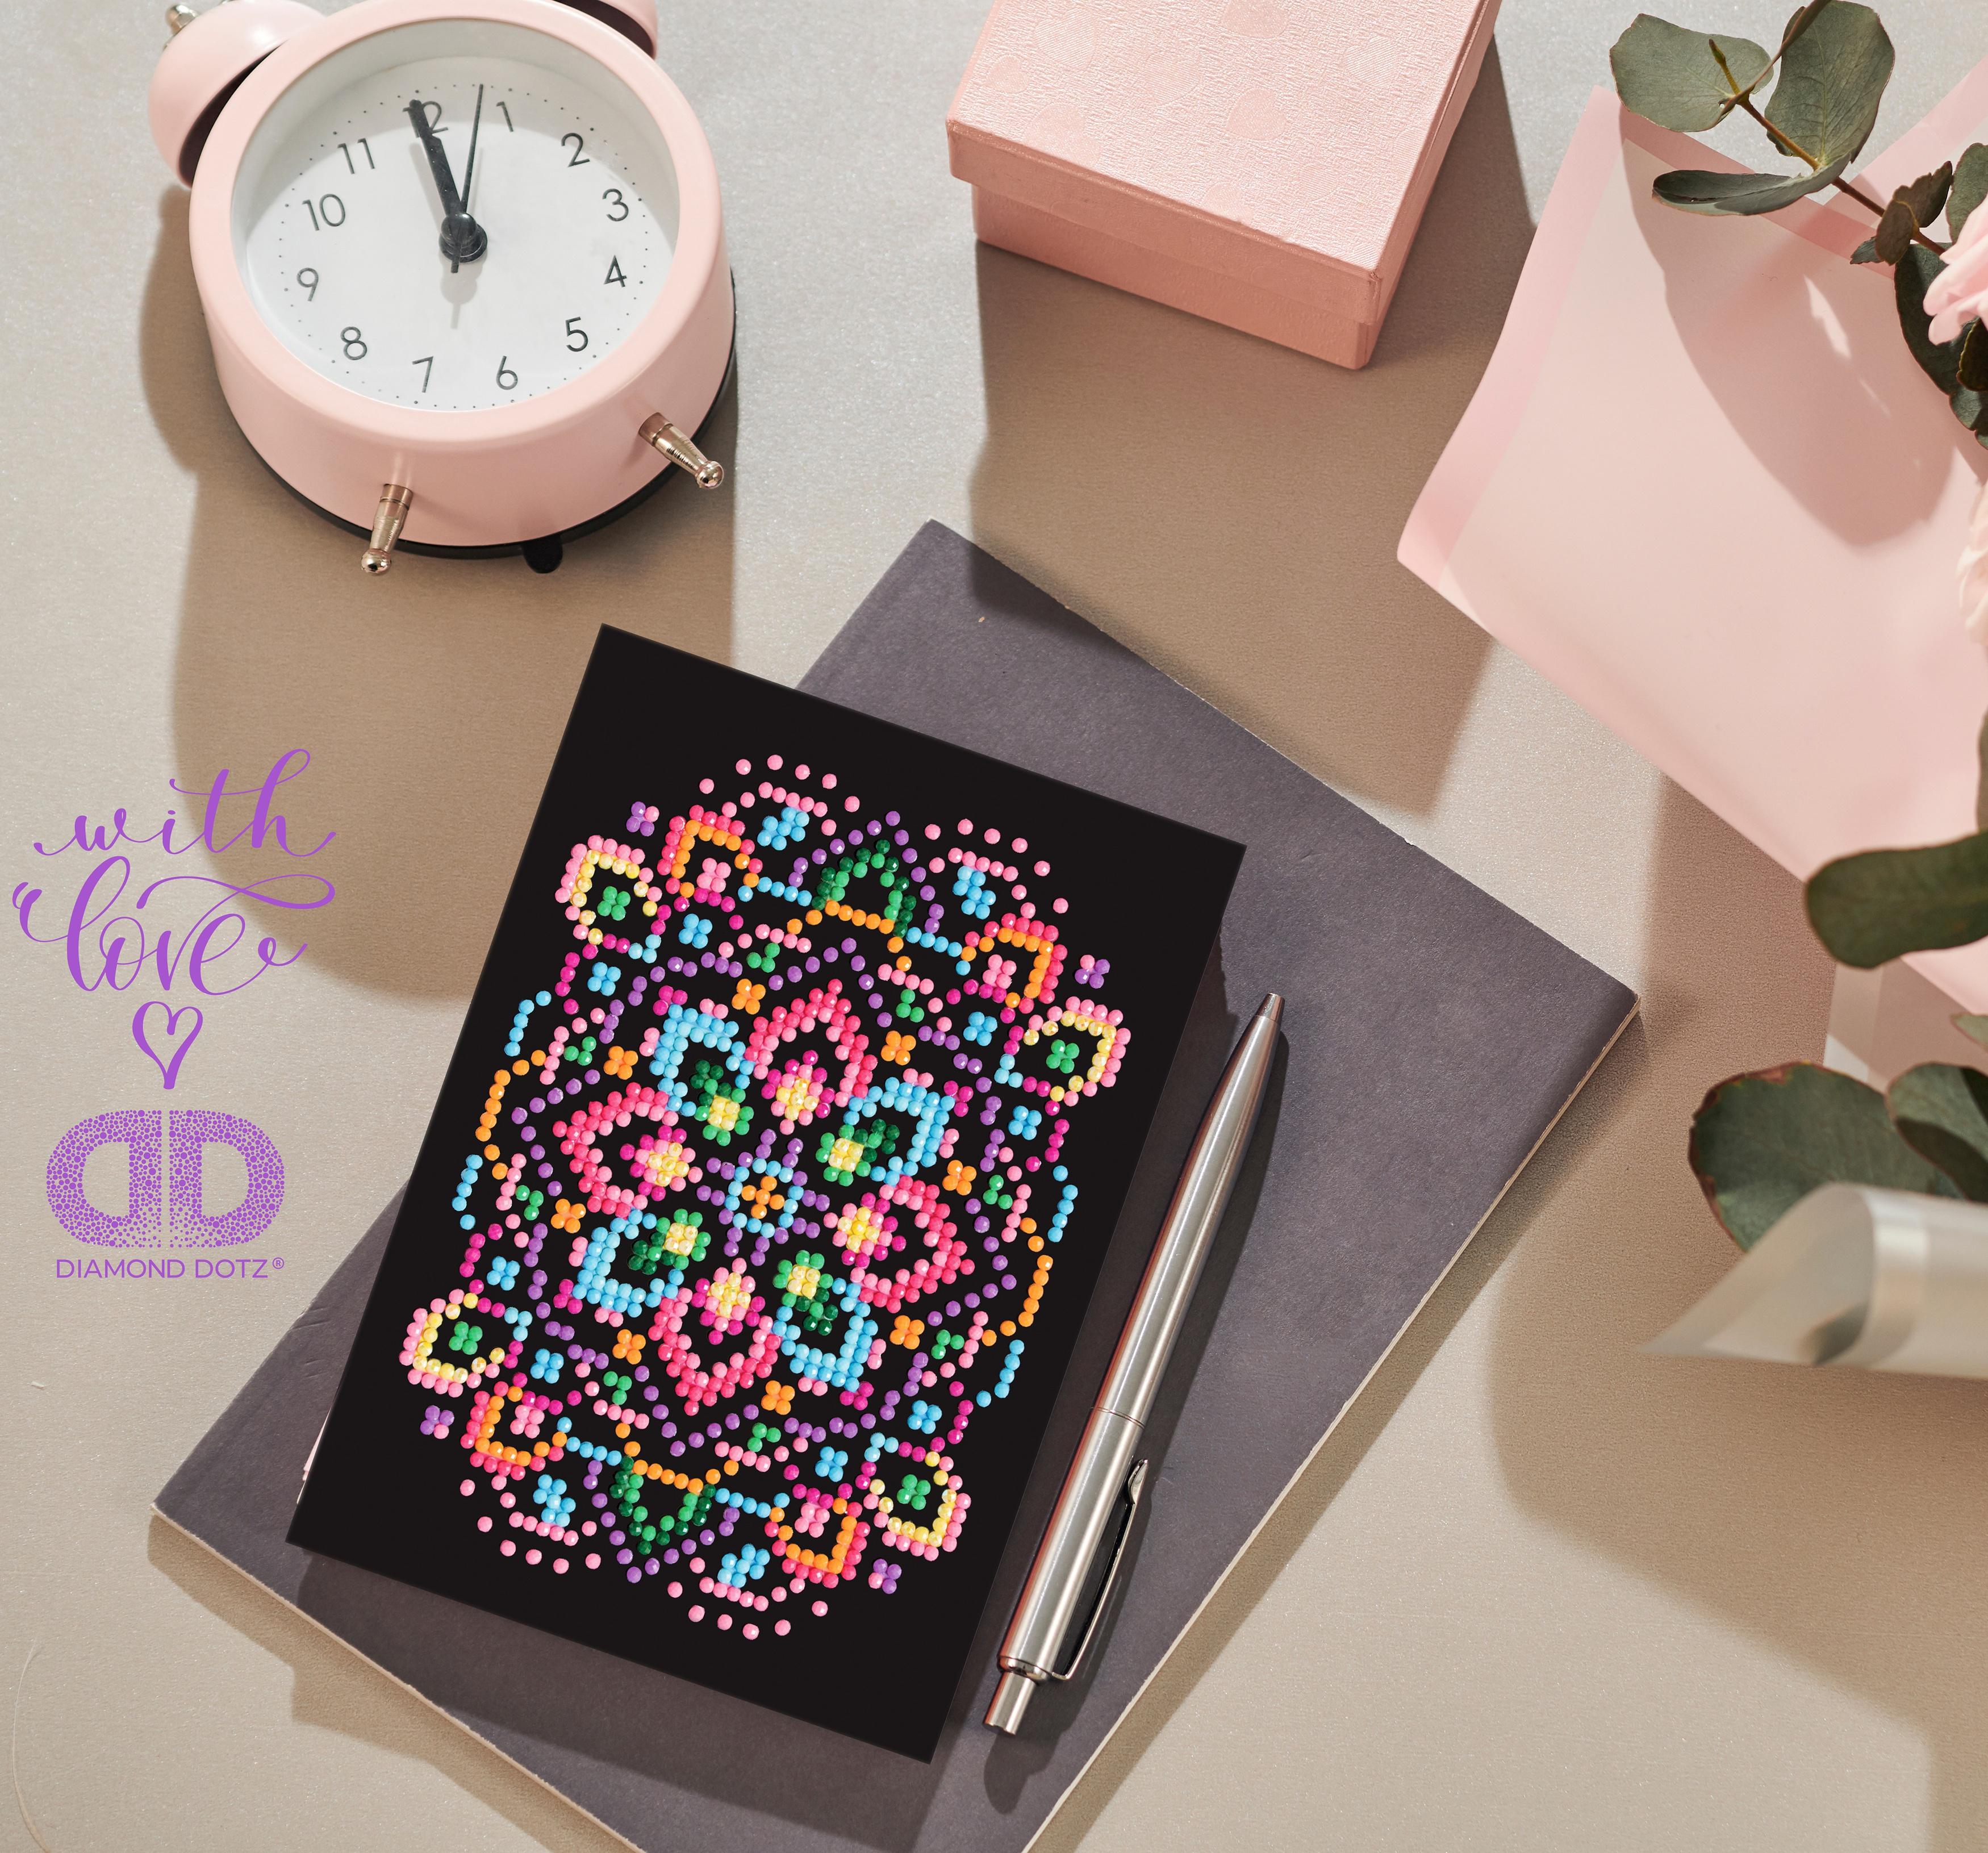 Diamond Dotz Diamond Embroidery Facet Art Greeting Card Kit-Blackstar